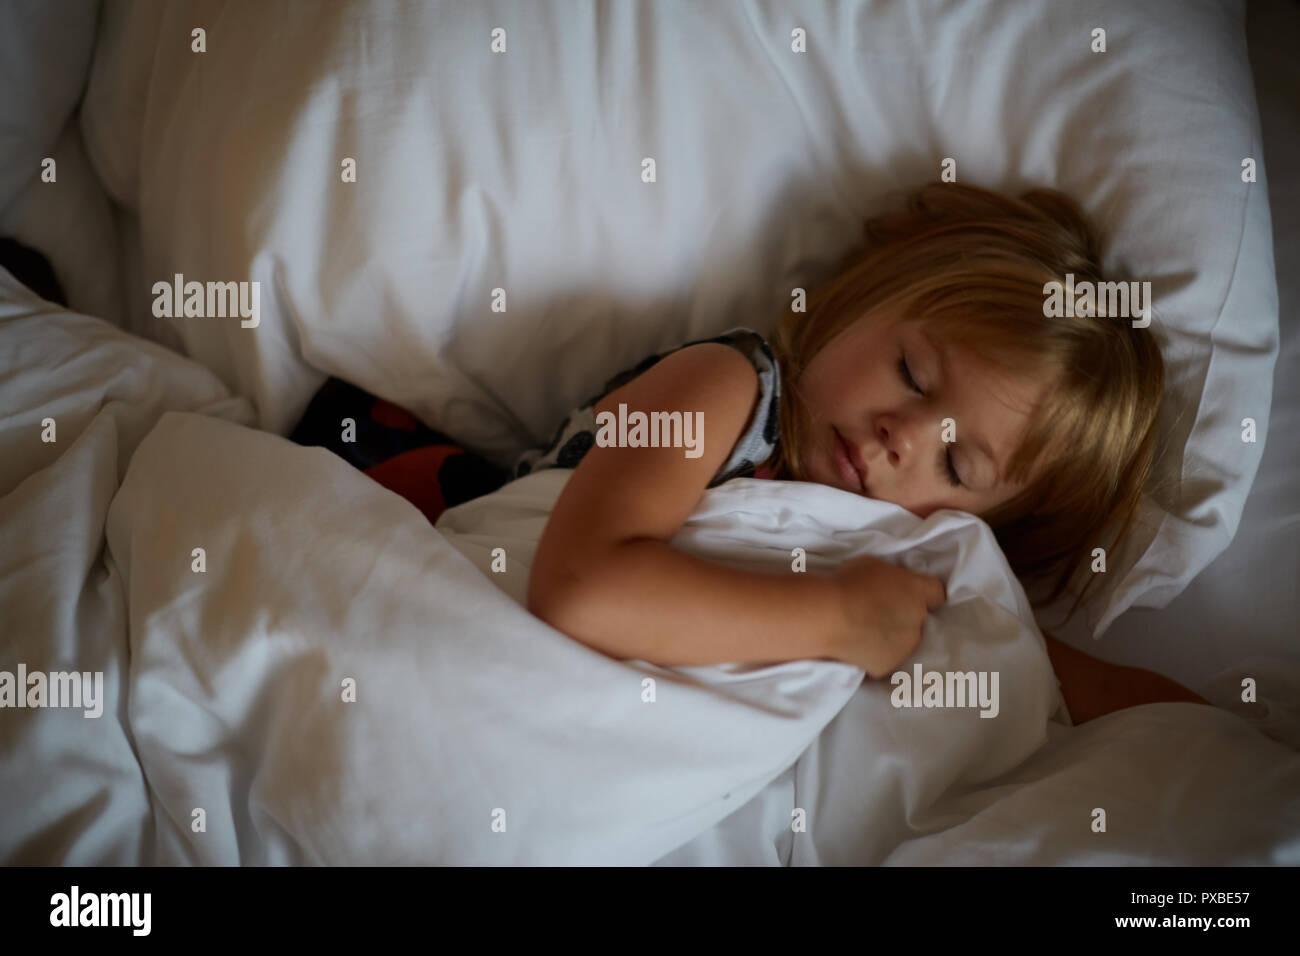 Girl lying in bed after sleeping. morning awakening, a fun morning, playing in bed - Stock Image